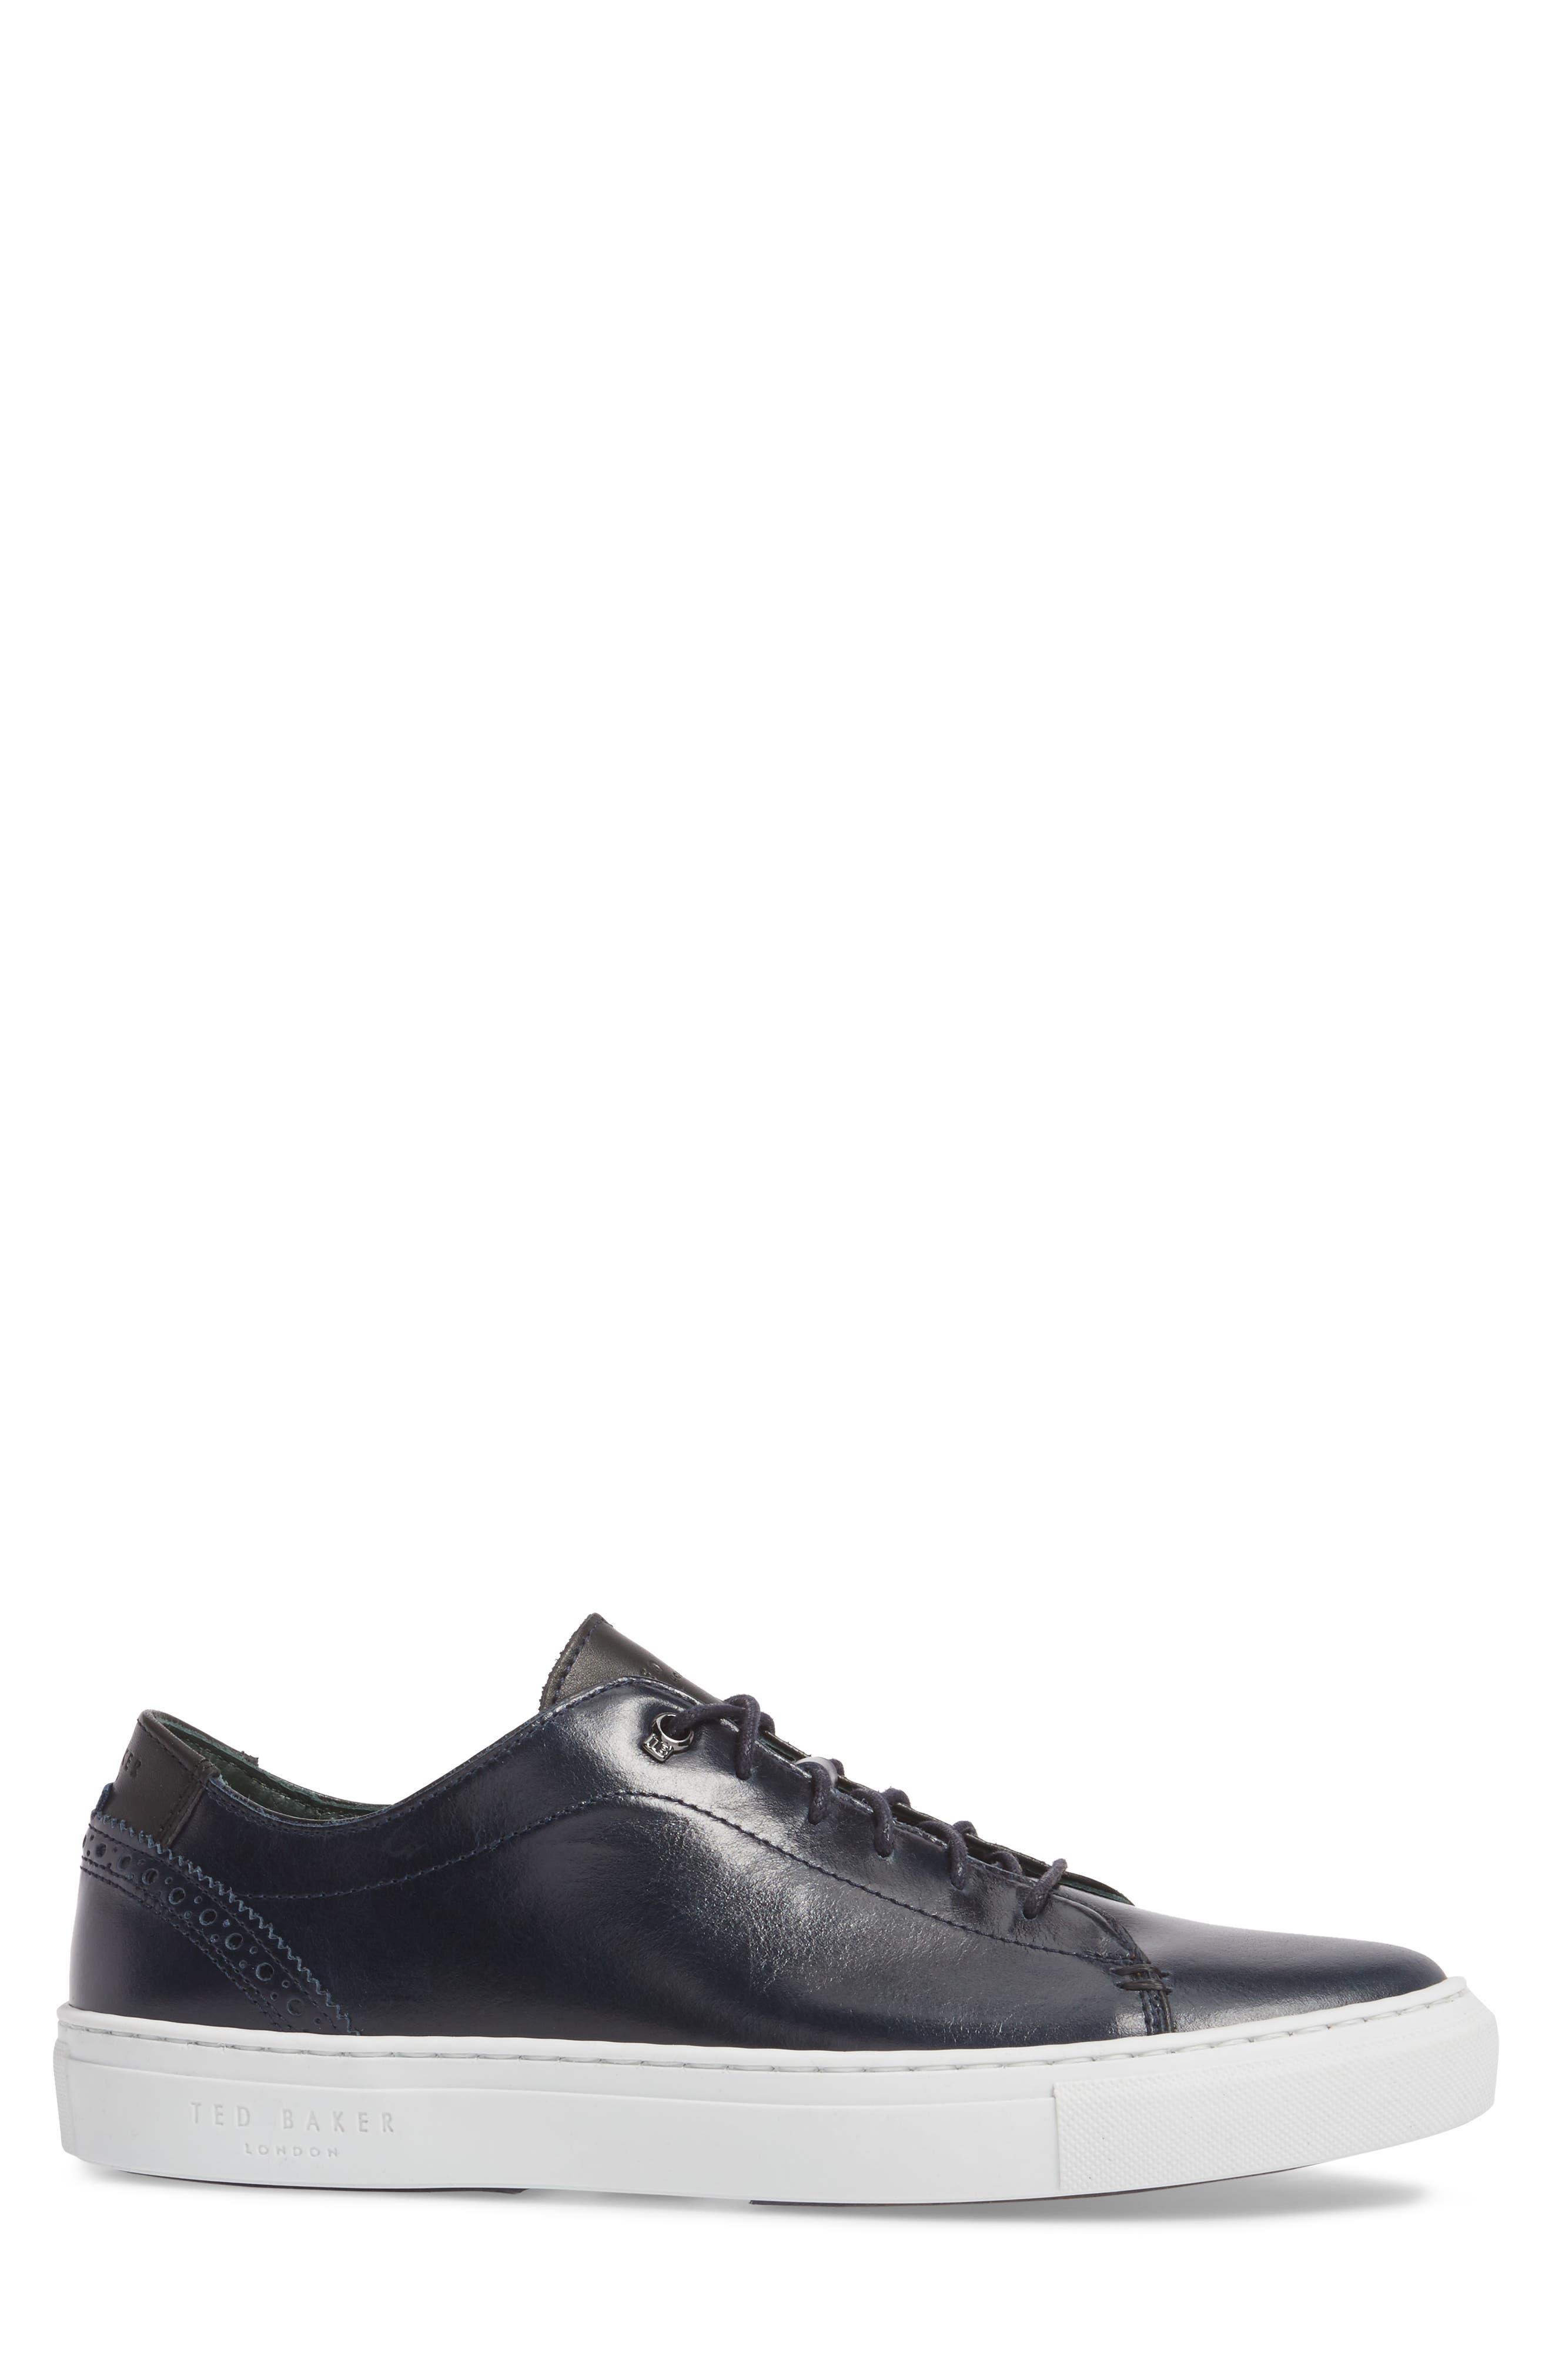 Duuke 2 Sneaker,                             Alternate thumbnail 3, color,                             Midnight Blue Leather